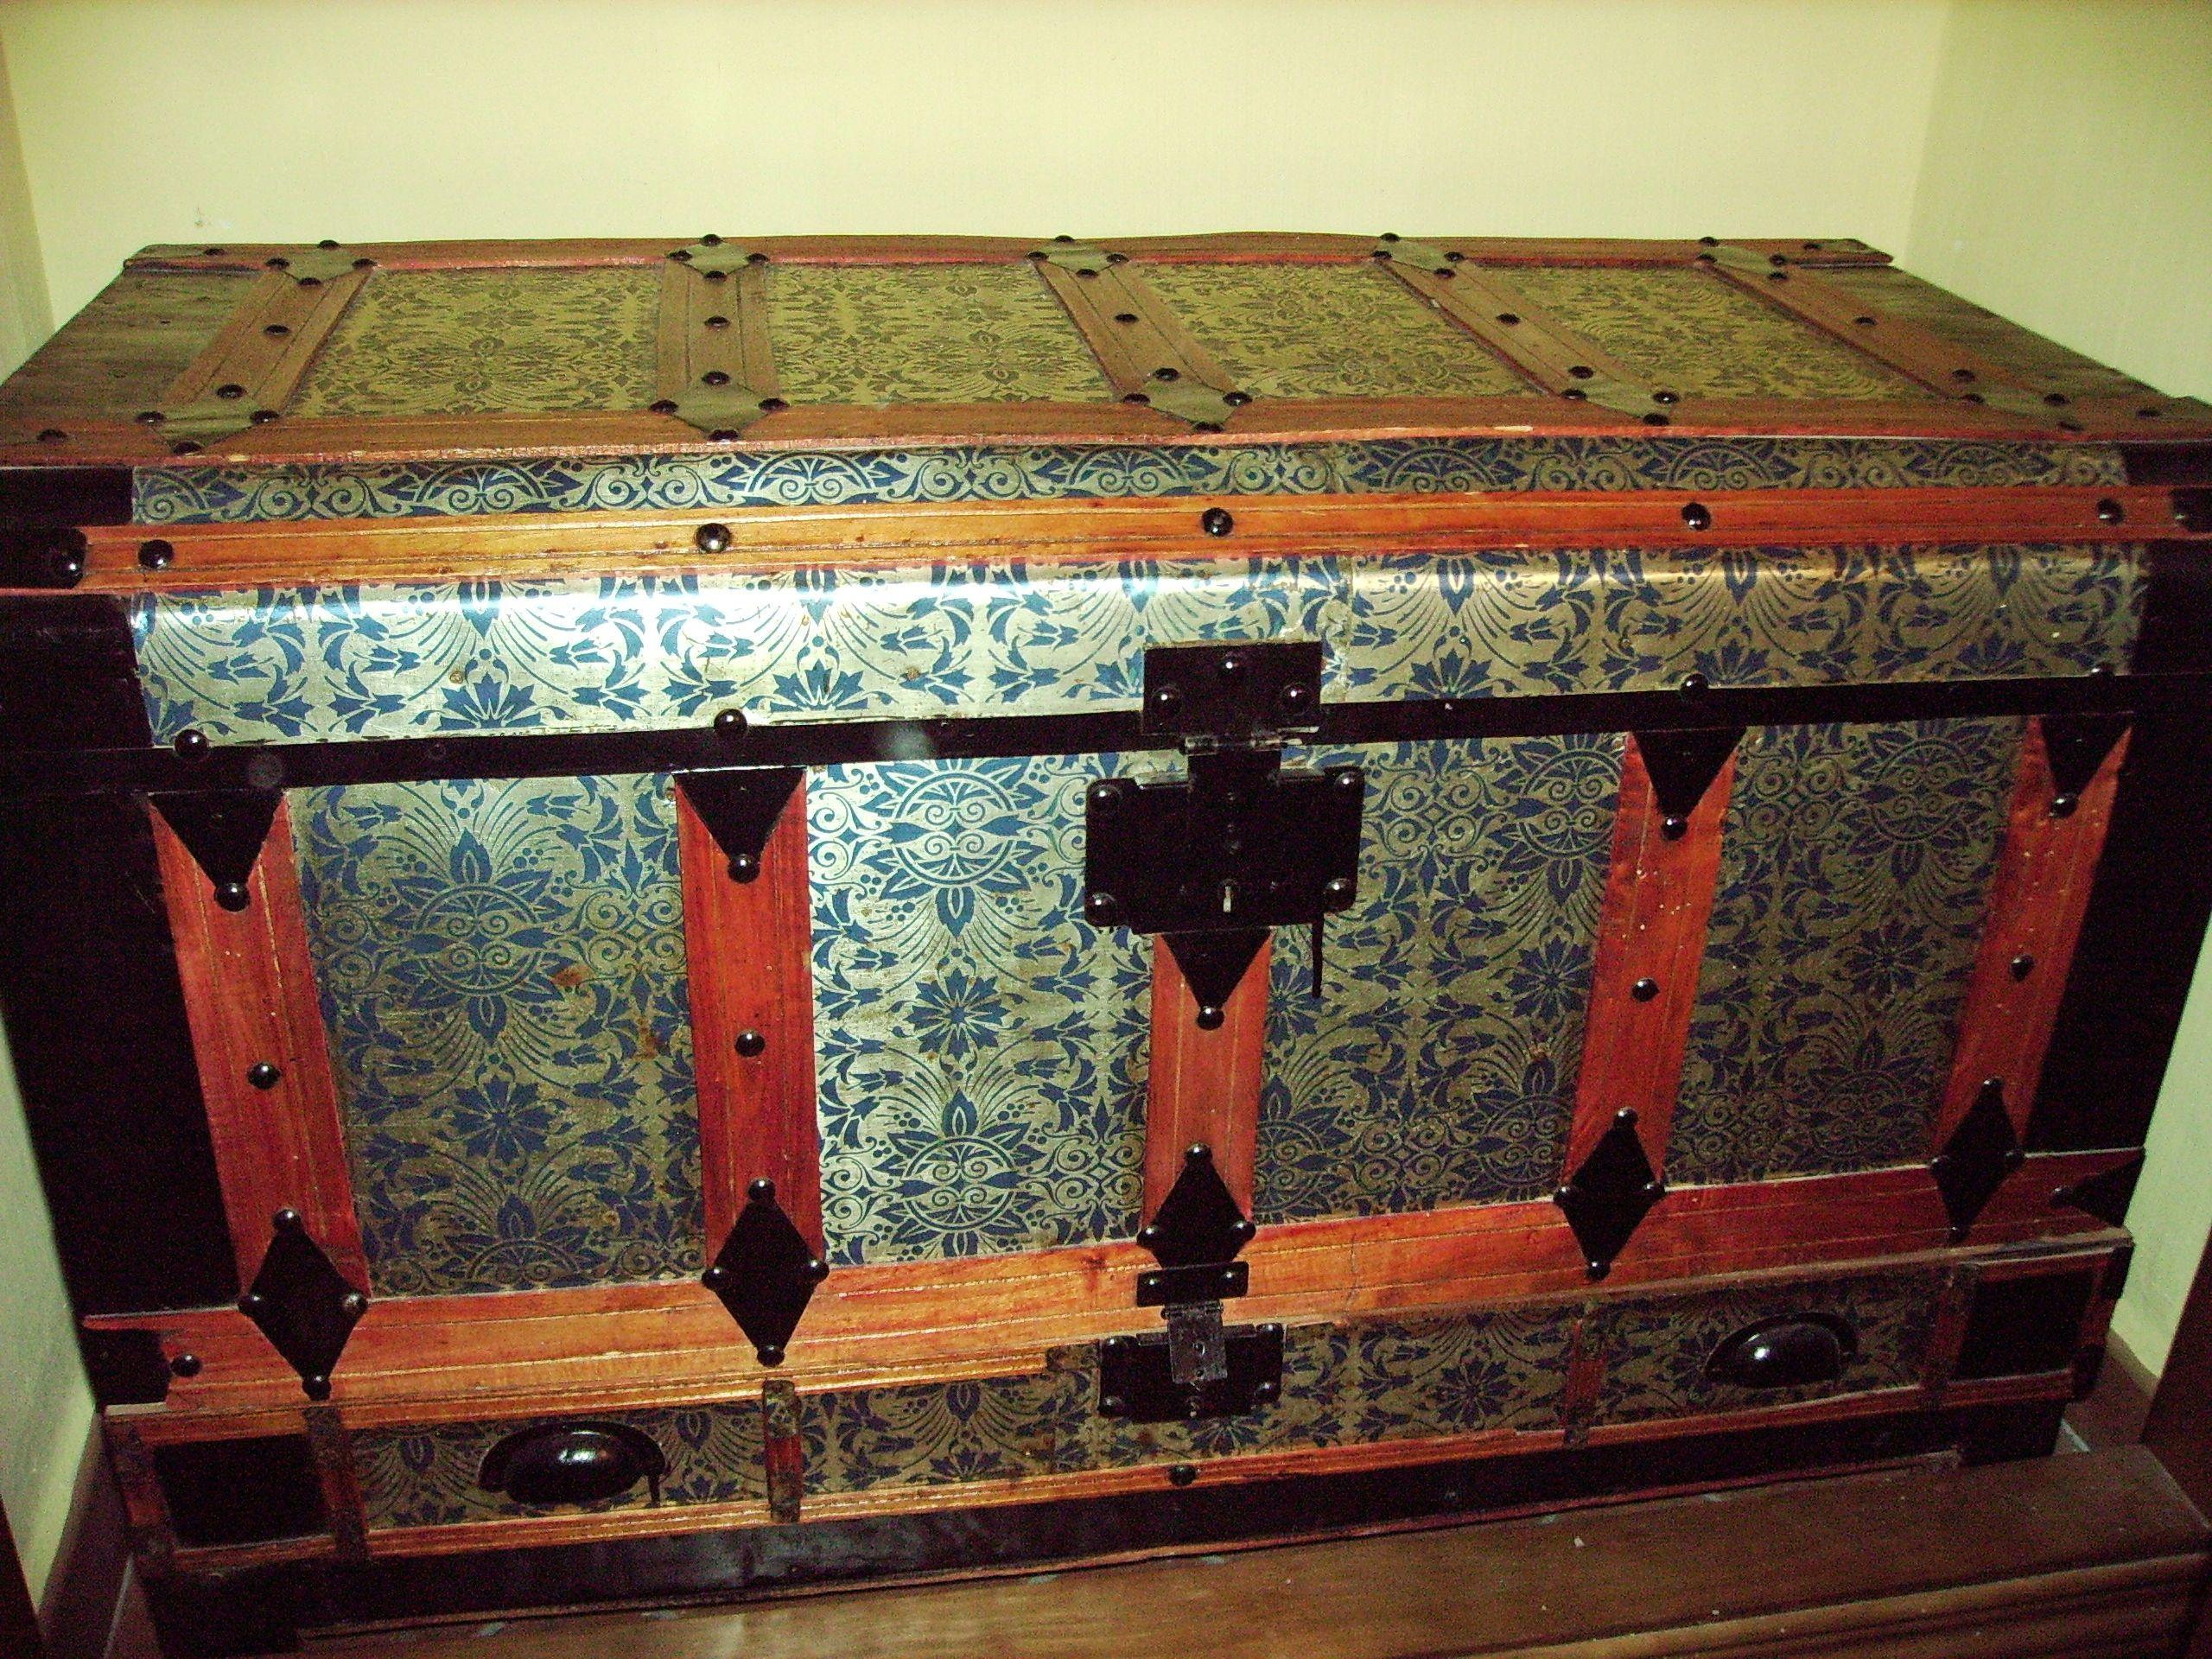 Baul 2560 1920 baules pinterest - Decorar baul vintage ...